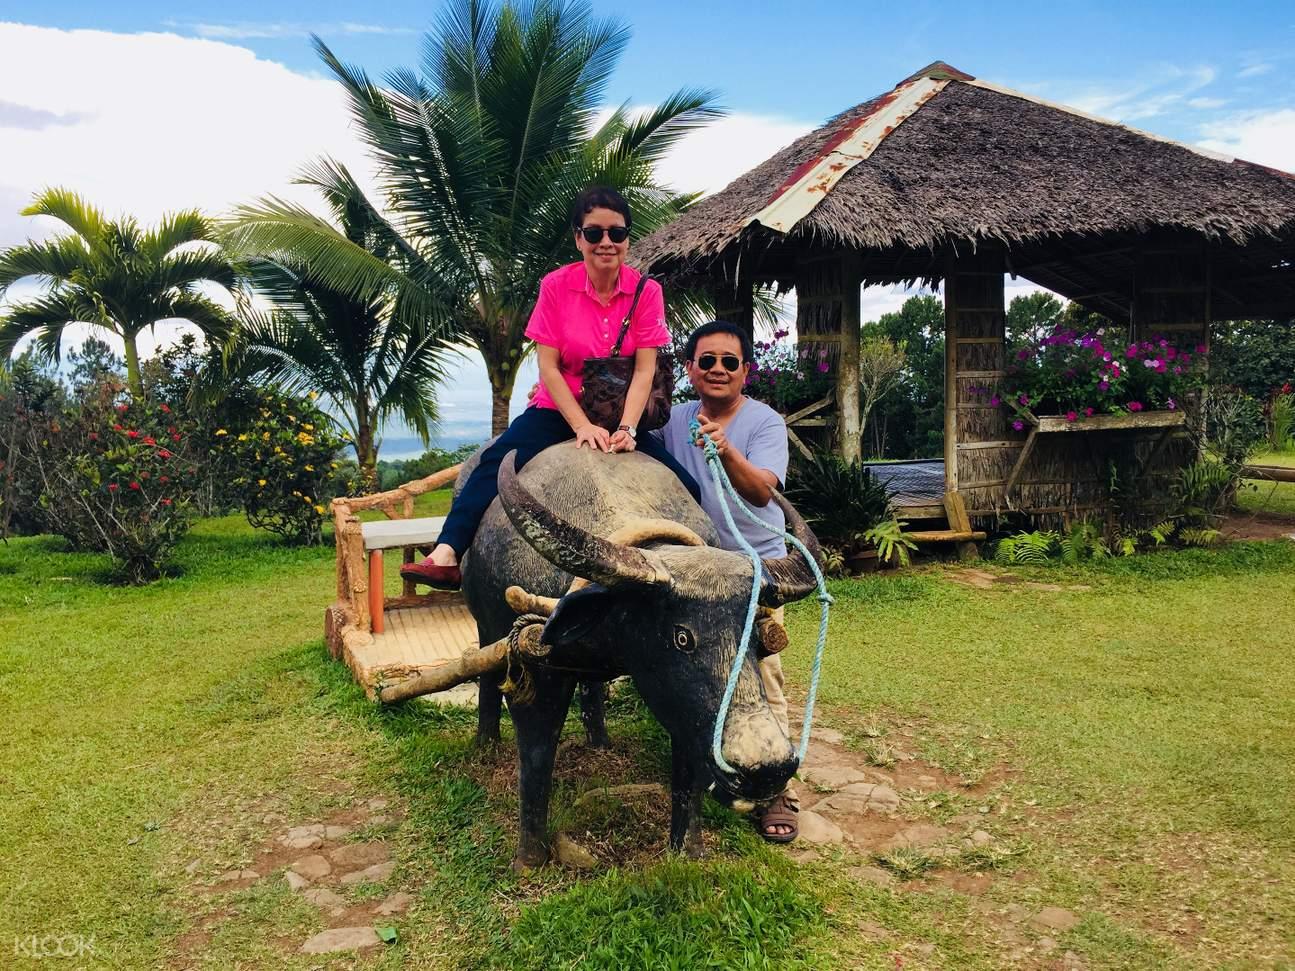 family riding the tamaraw statue